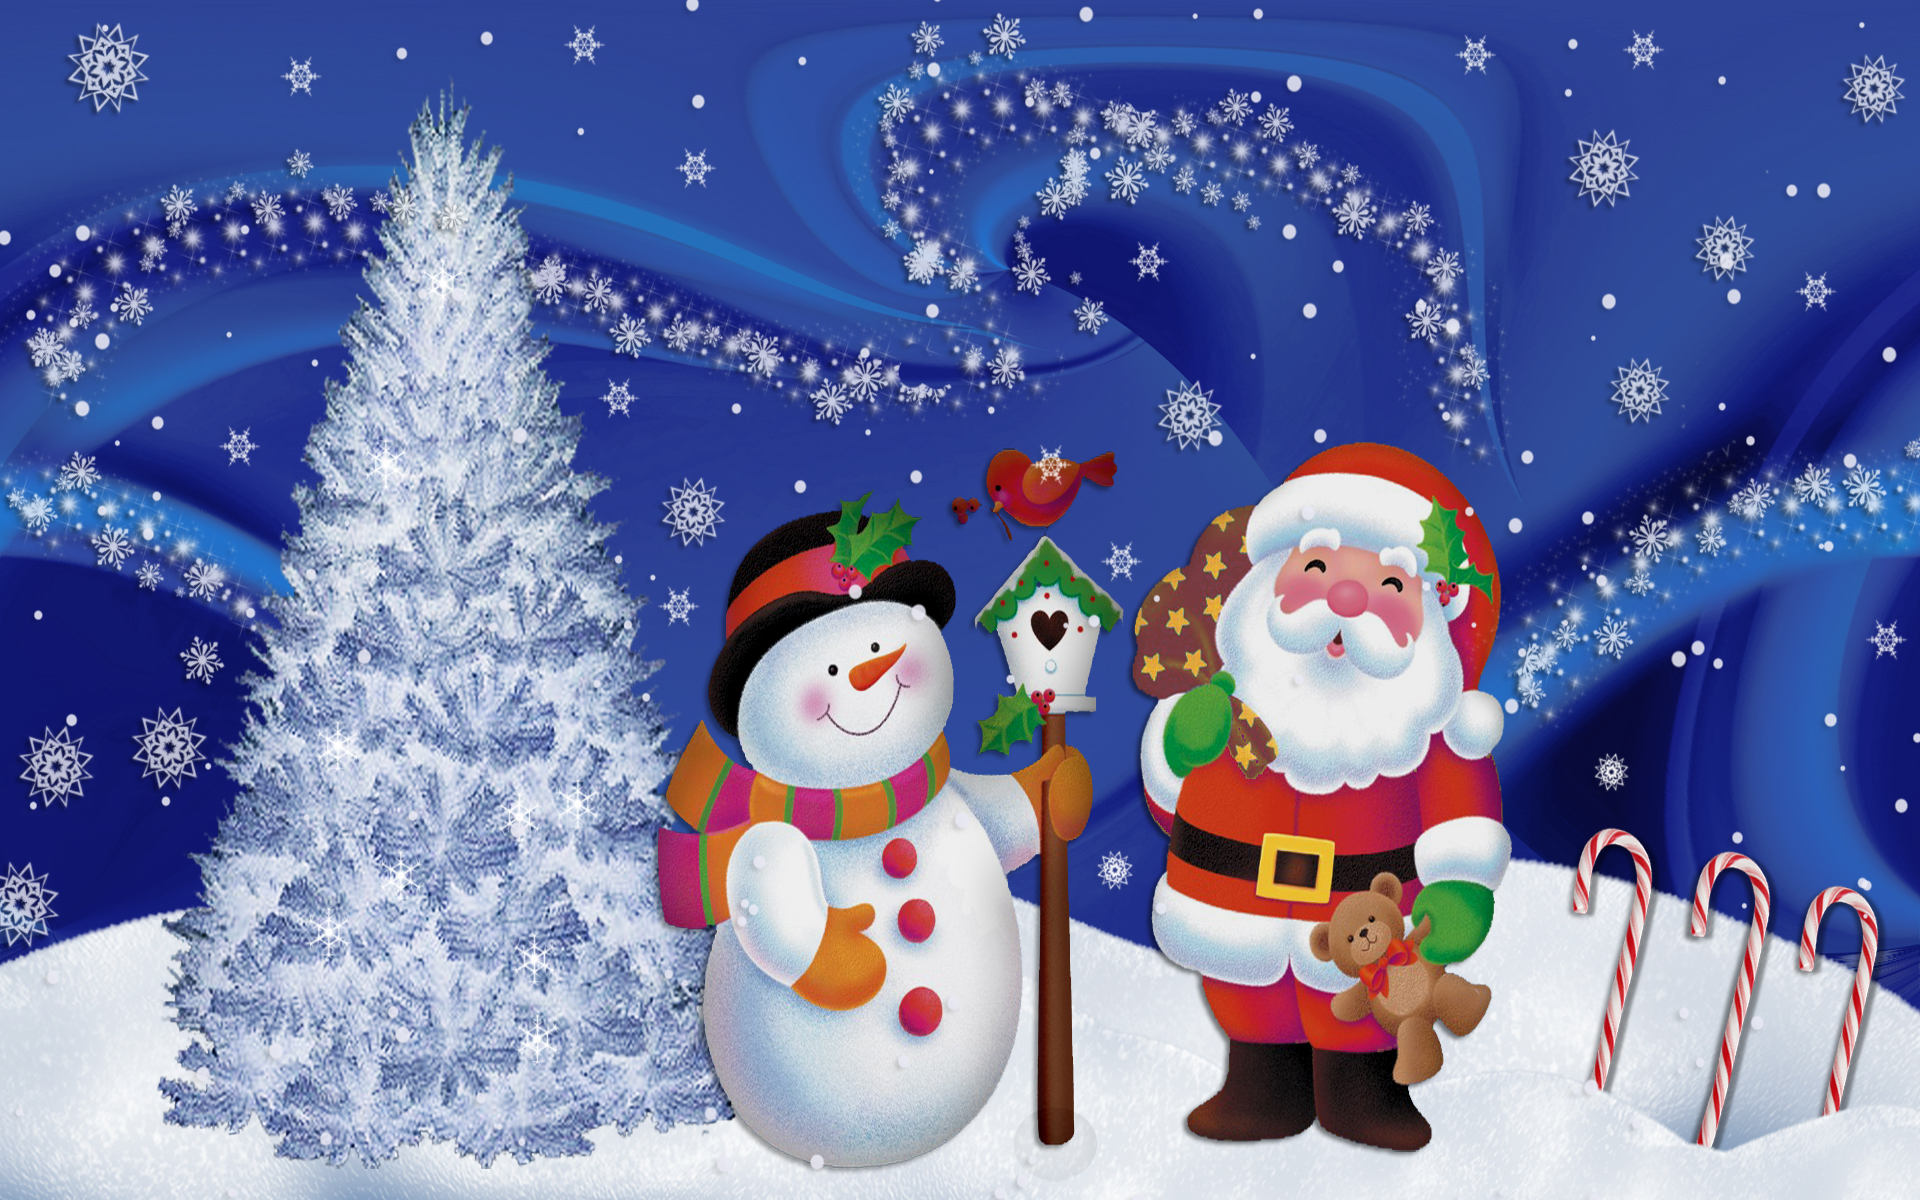 merry christmas wallpapers santa - HD Desktop Wallpapers | 4k HD